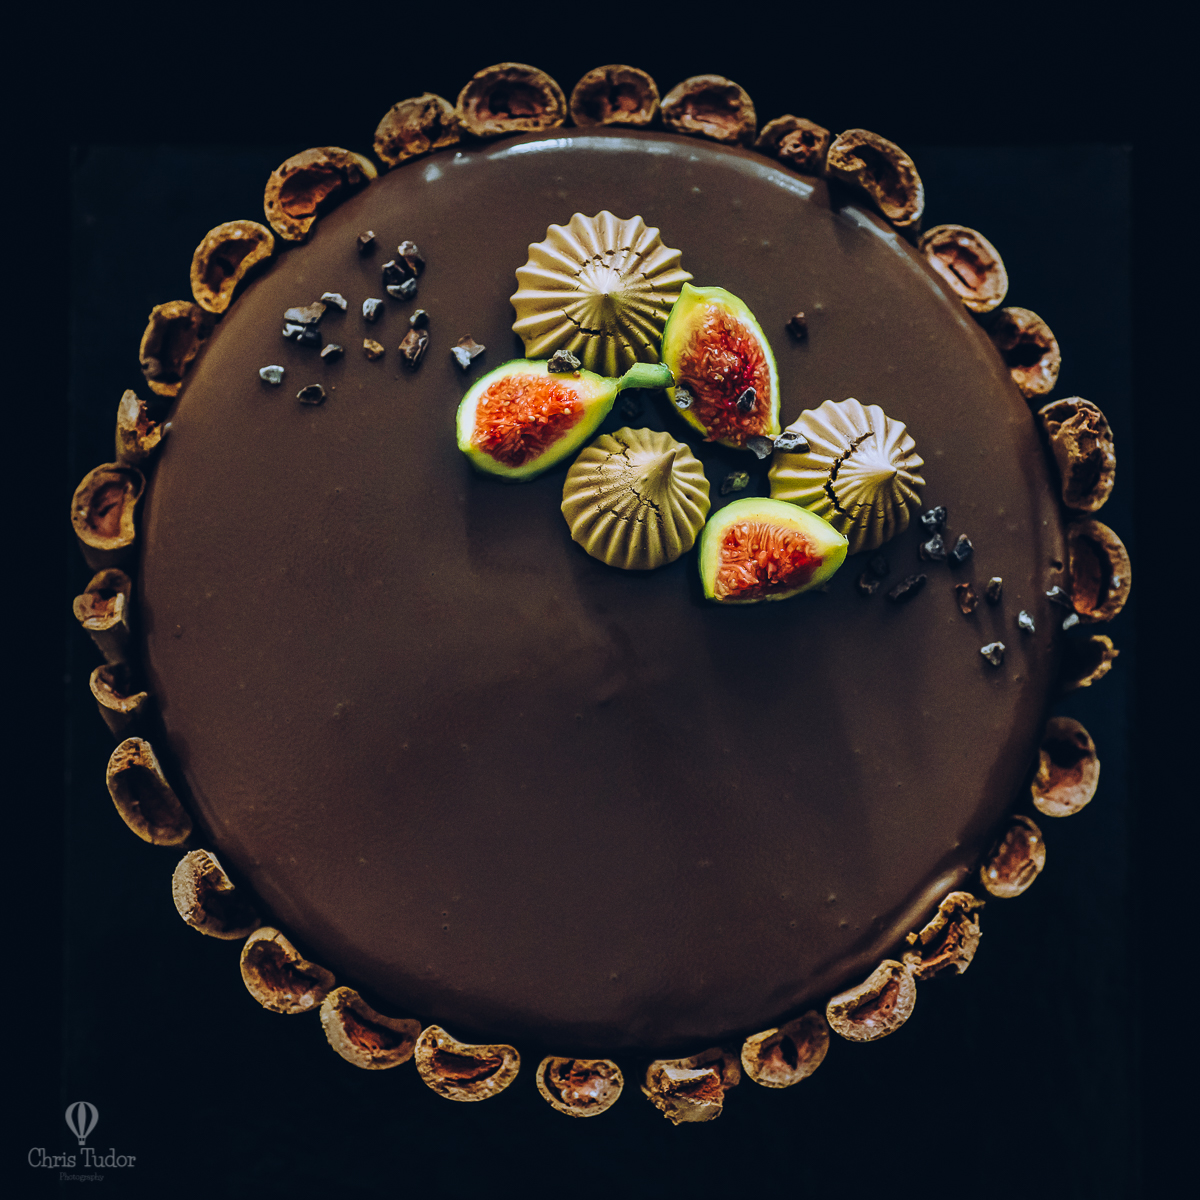 cristina-tudor-food-photography (17).jpg